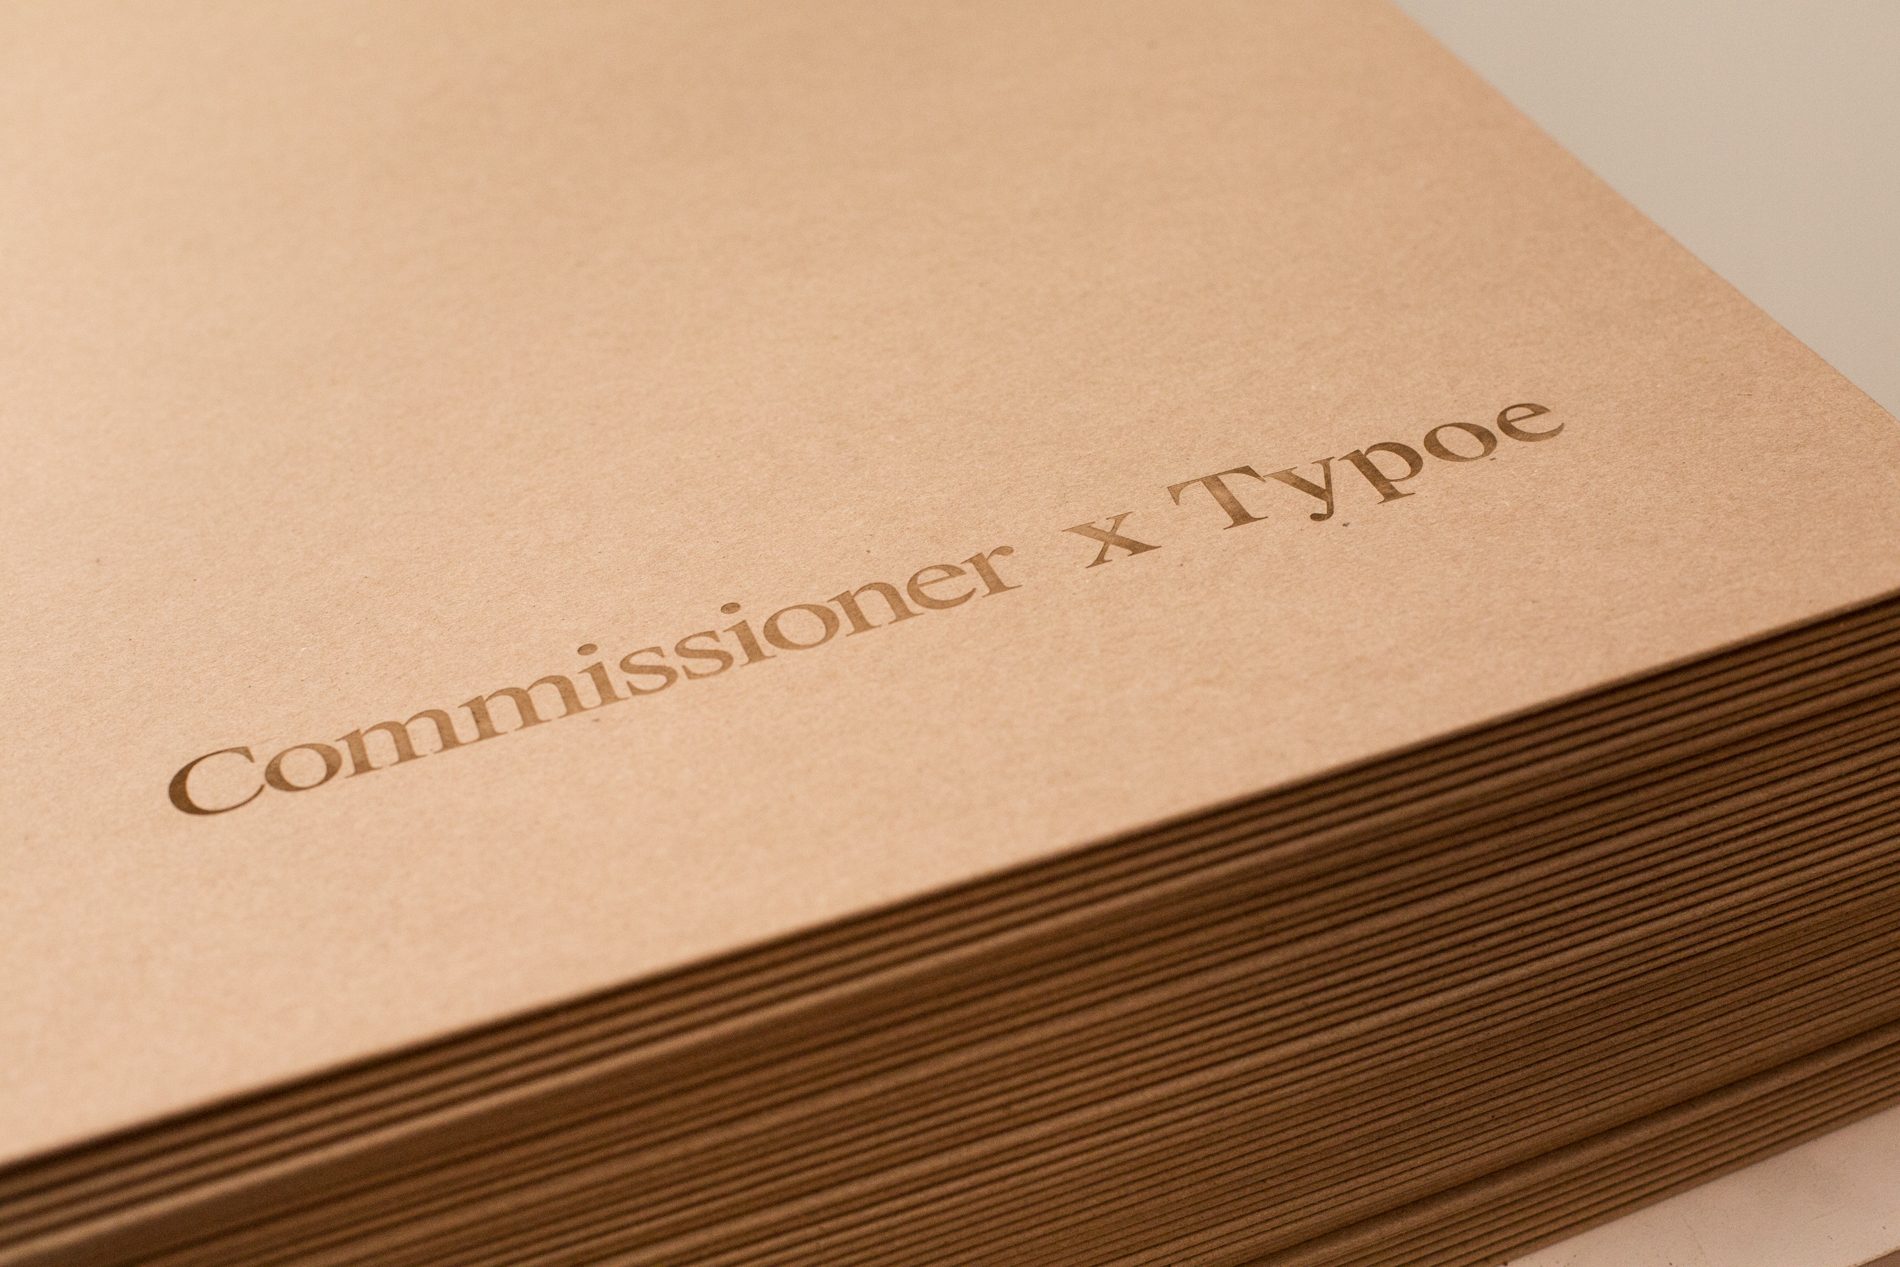 10252018 Commissioner and Typoe web-33.jpg